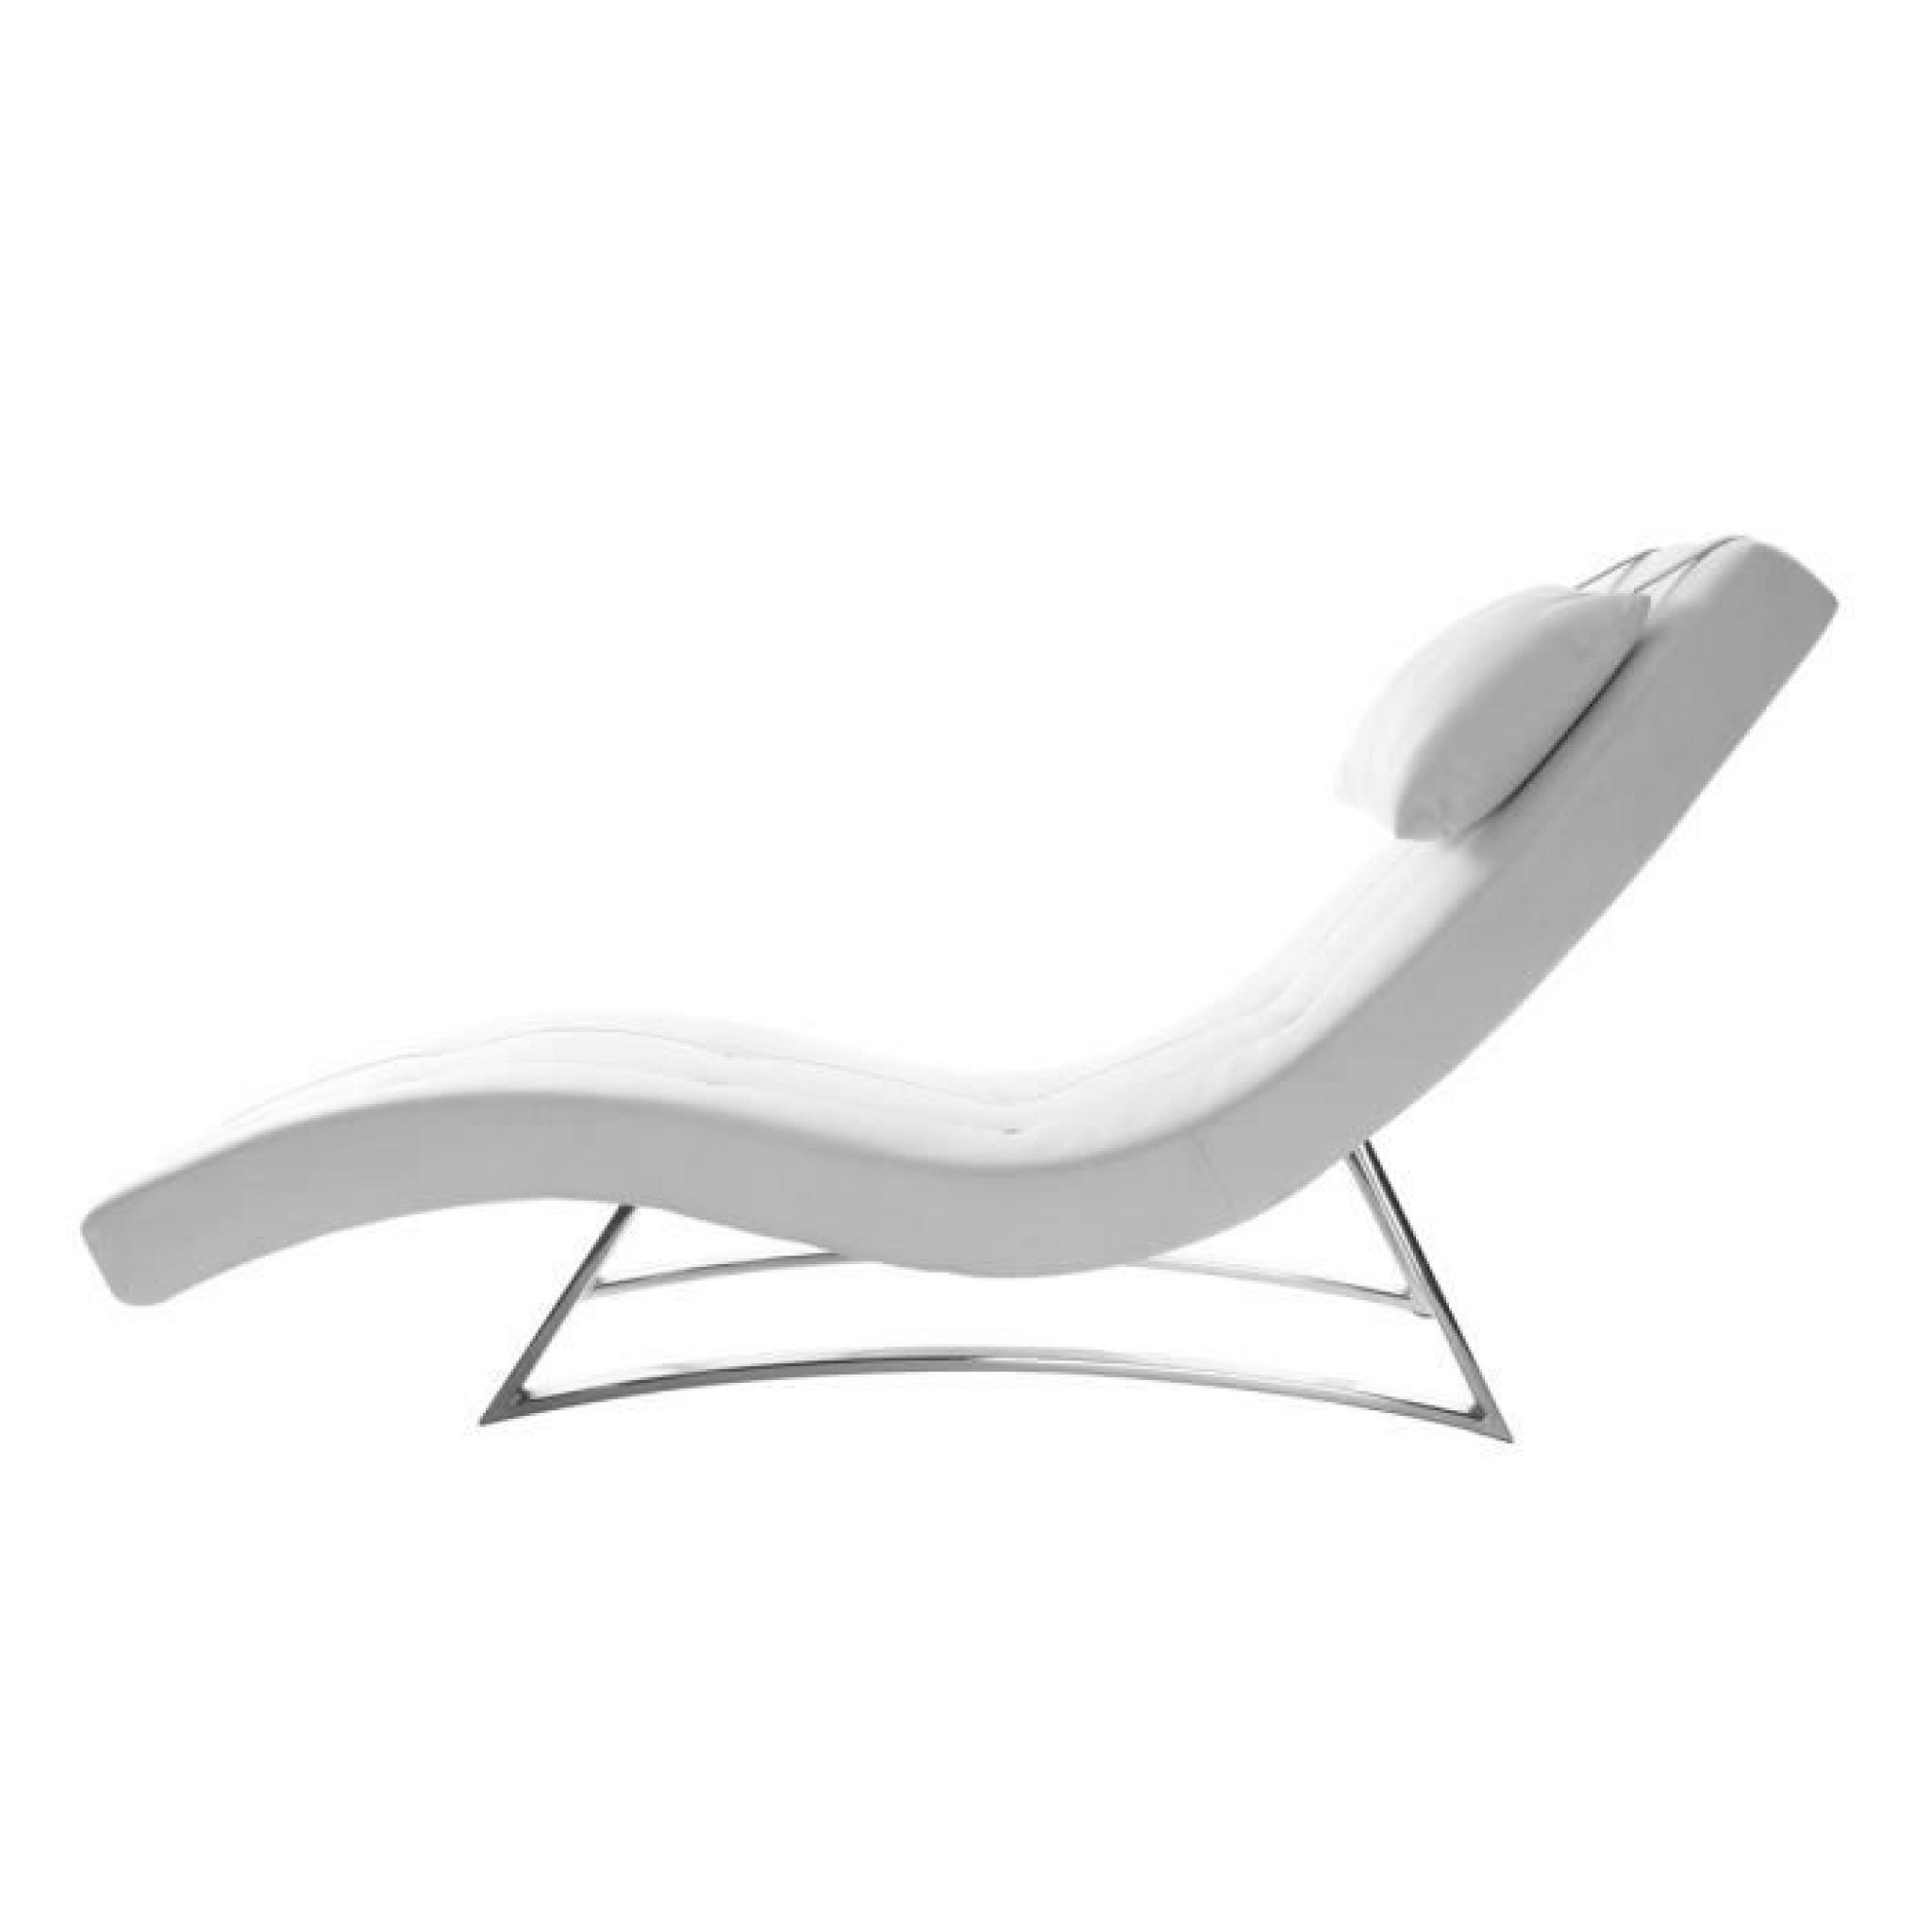 Chaise longue design blanc MONACO Miliboo